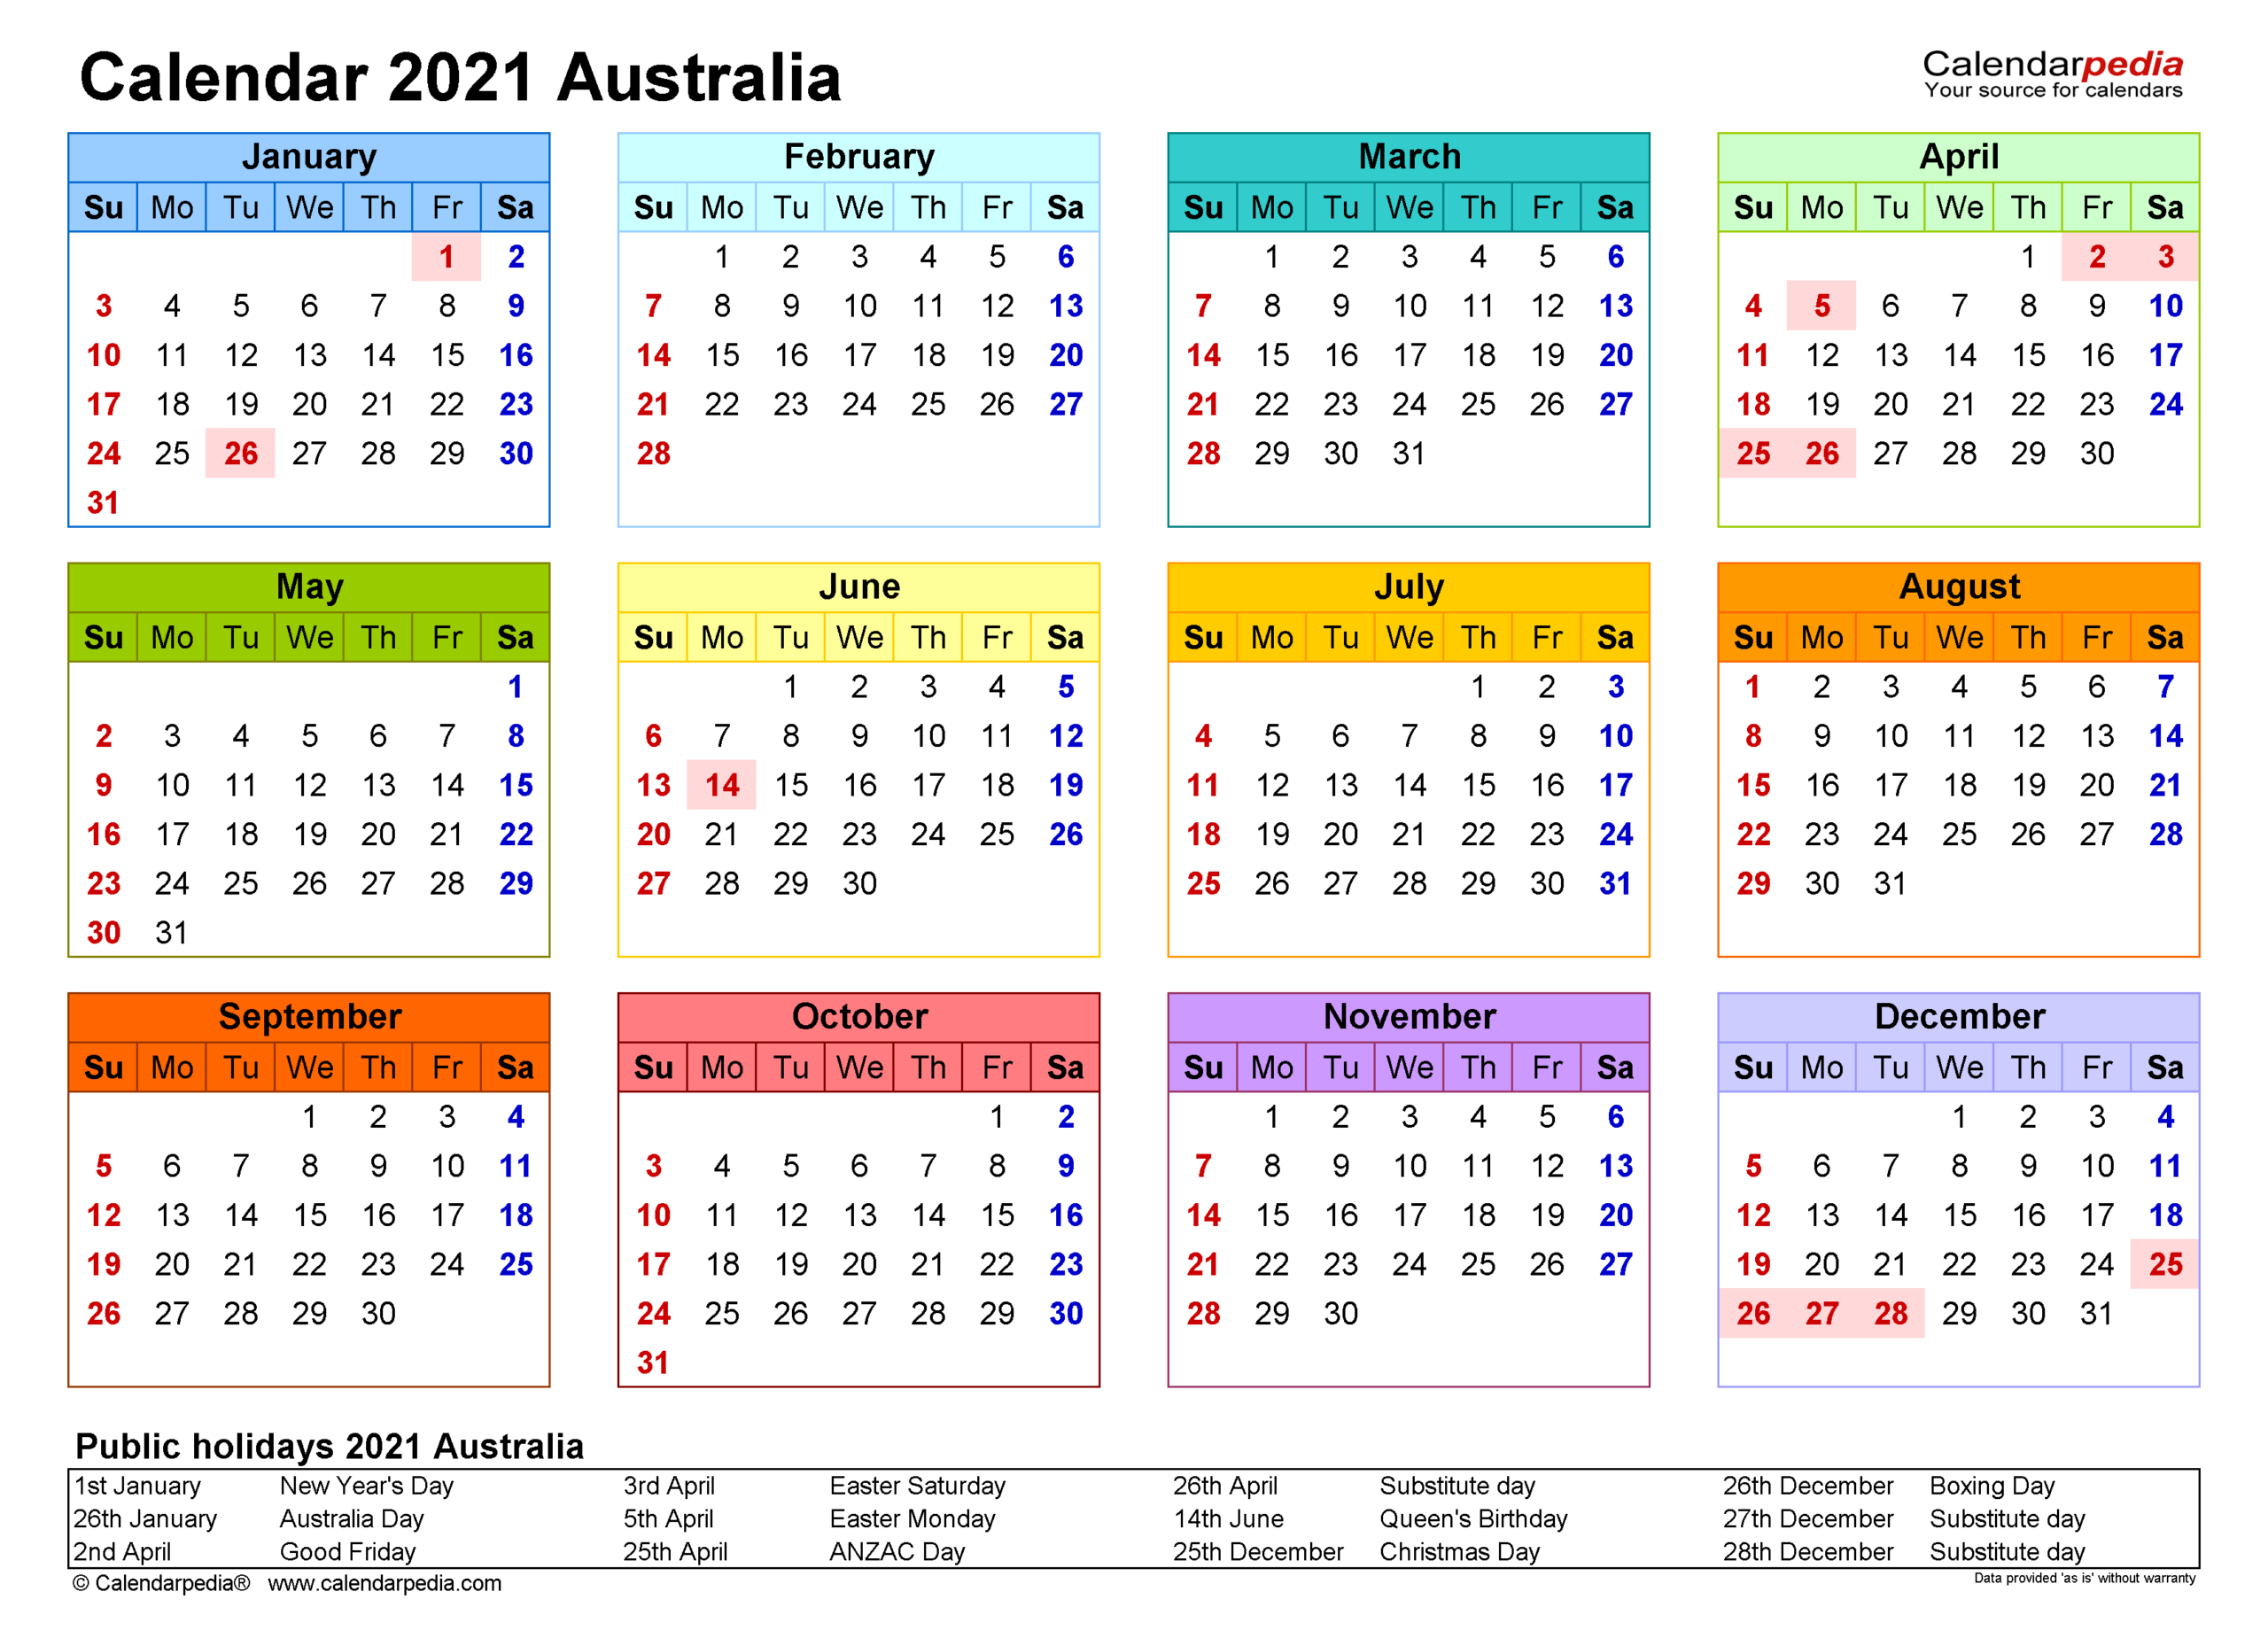 Australia Calendar 2021 - Free Printable Word Templates in 2021 Calendar To Fill In